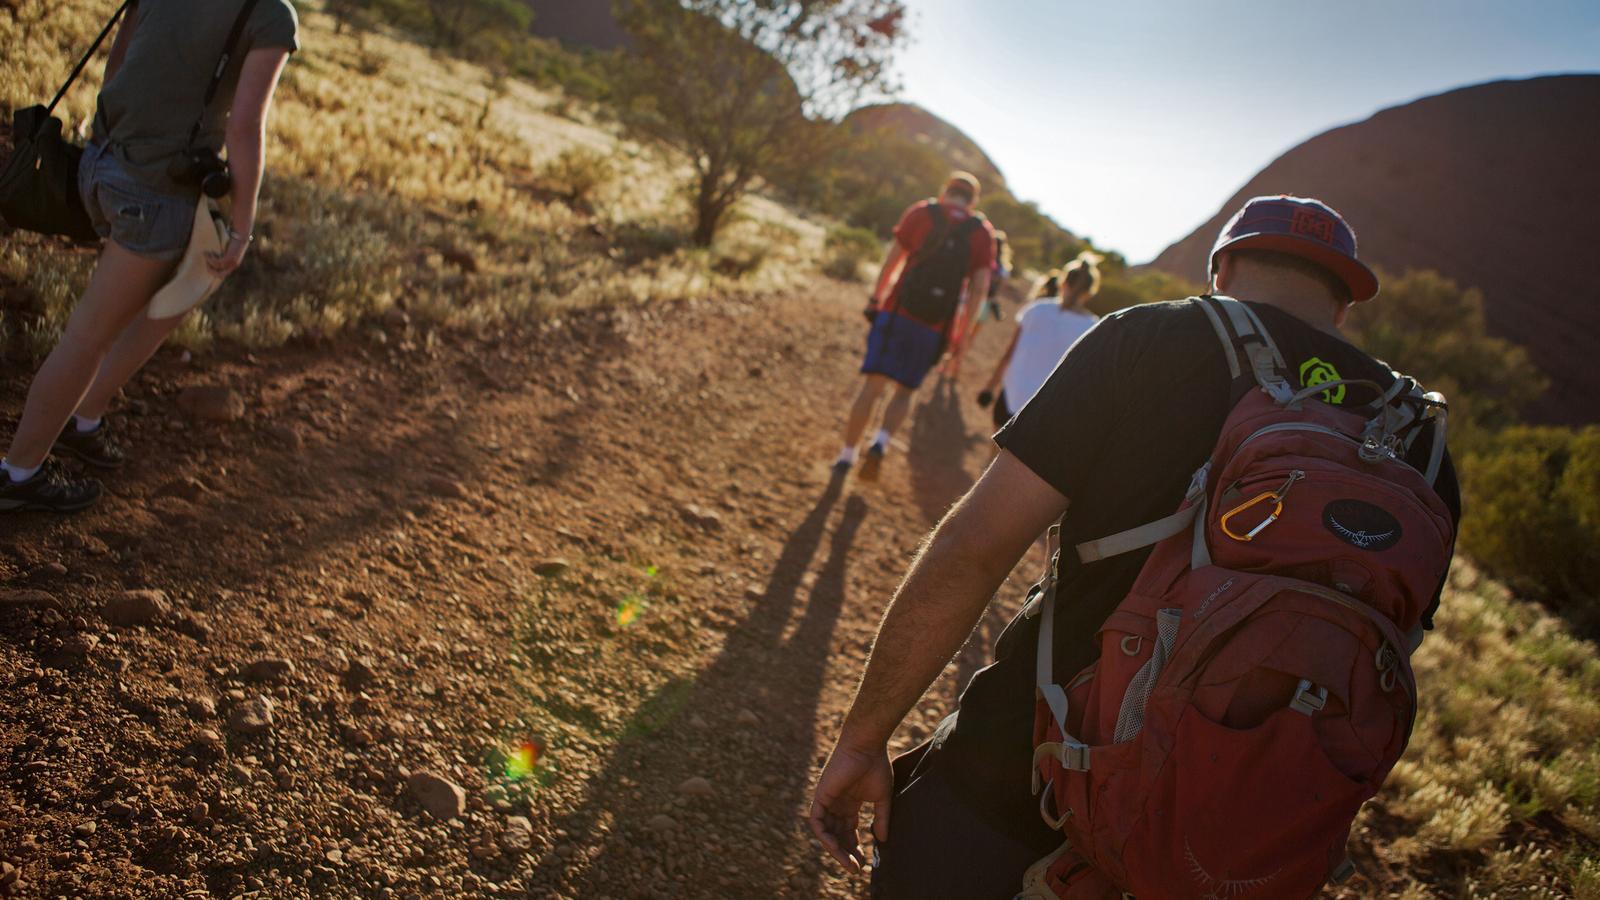 Ayers Rock in Australien im Northern Territory Outback traveljunkies Reisen für junge Leute